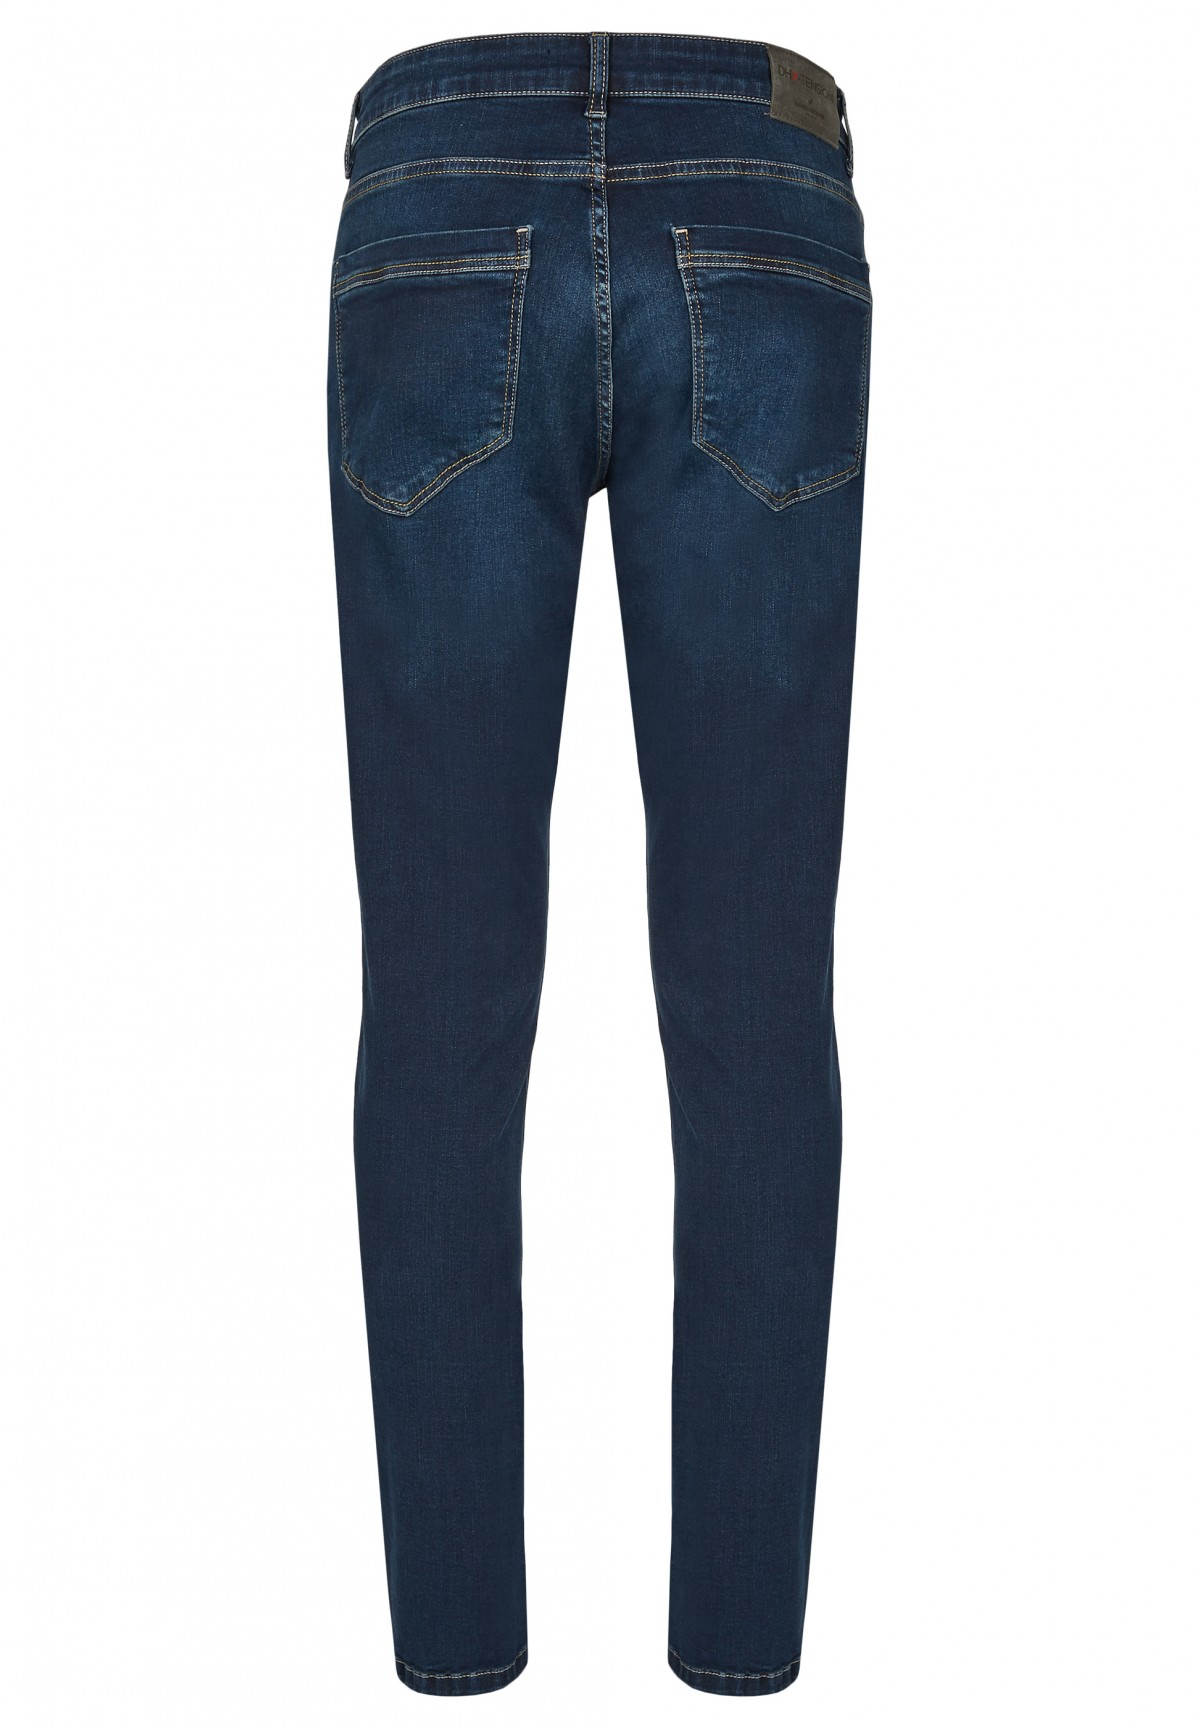 DH-X Jeans / DH-X Jeans